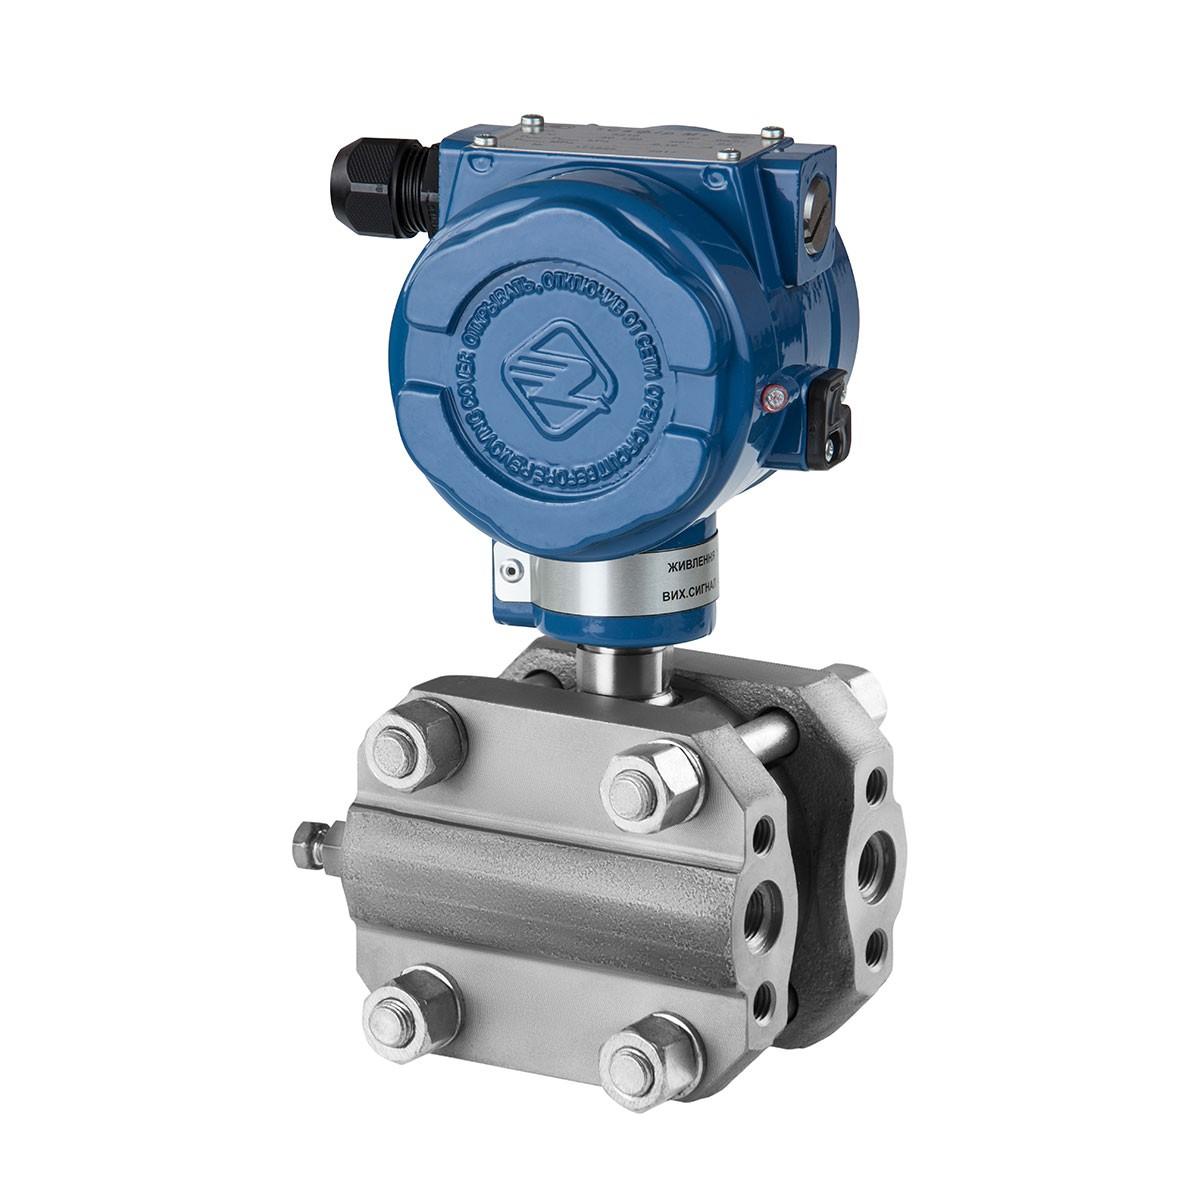 Smart Differential Pressure Transmitters Safir-M 7410